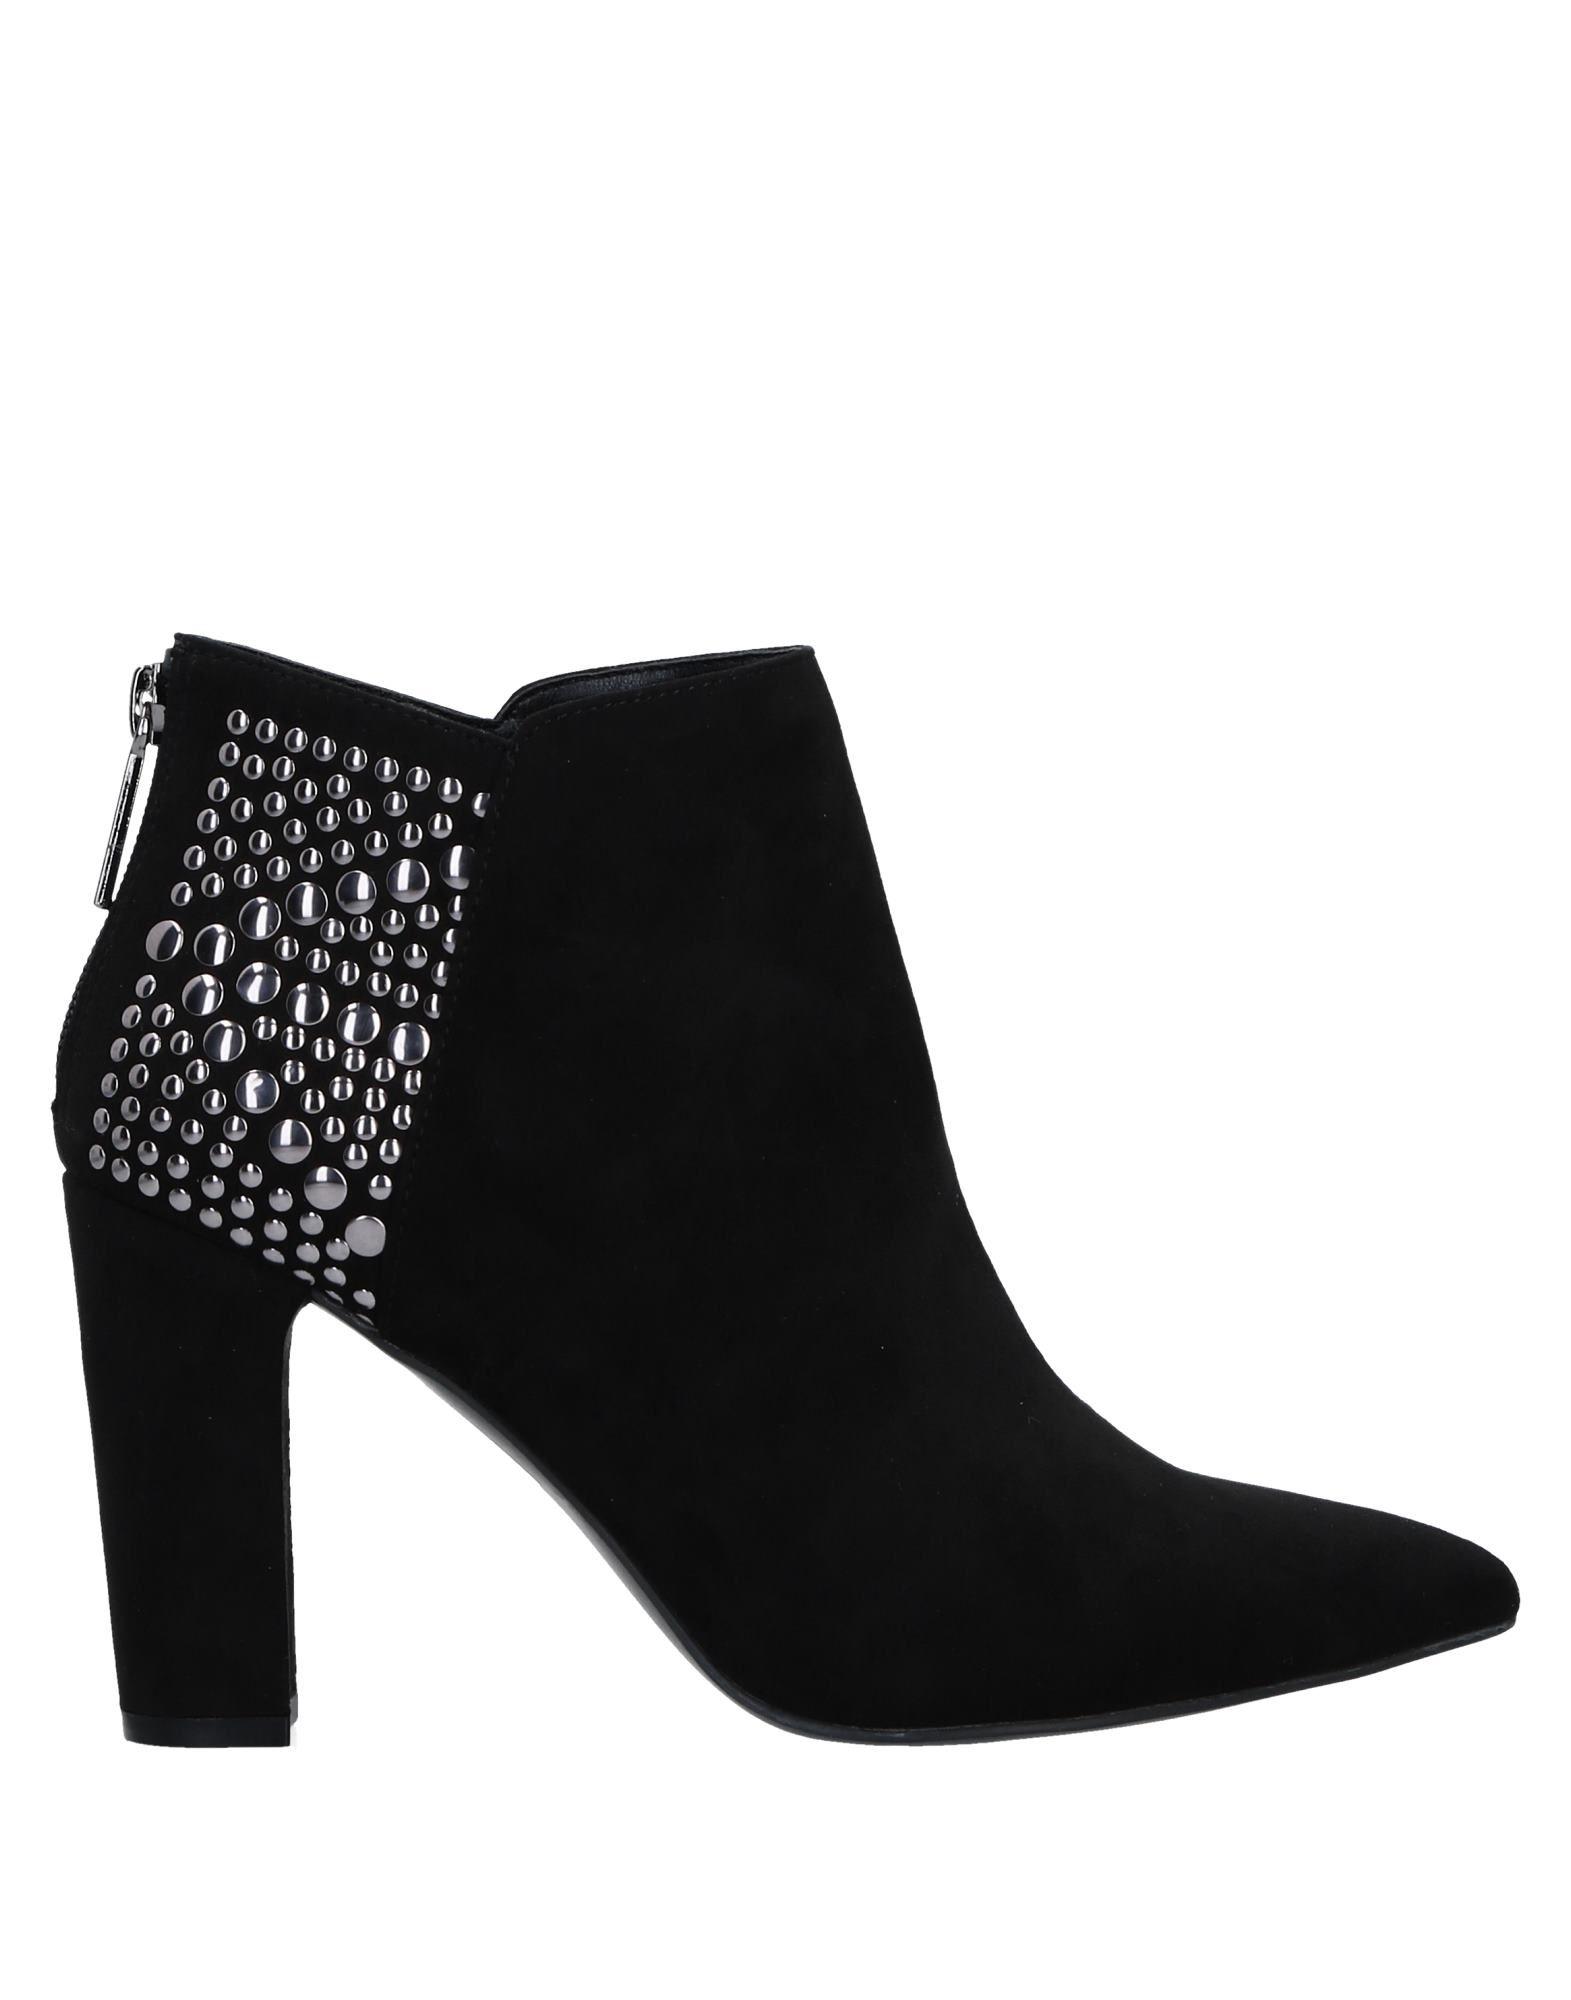 My Twin By Twin Set Stiefelette Damen  11539677GI Gute Qualität beliebte Schuhe